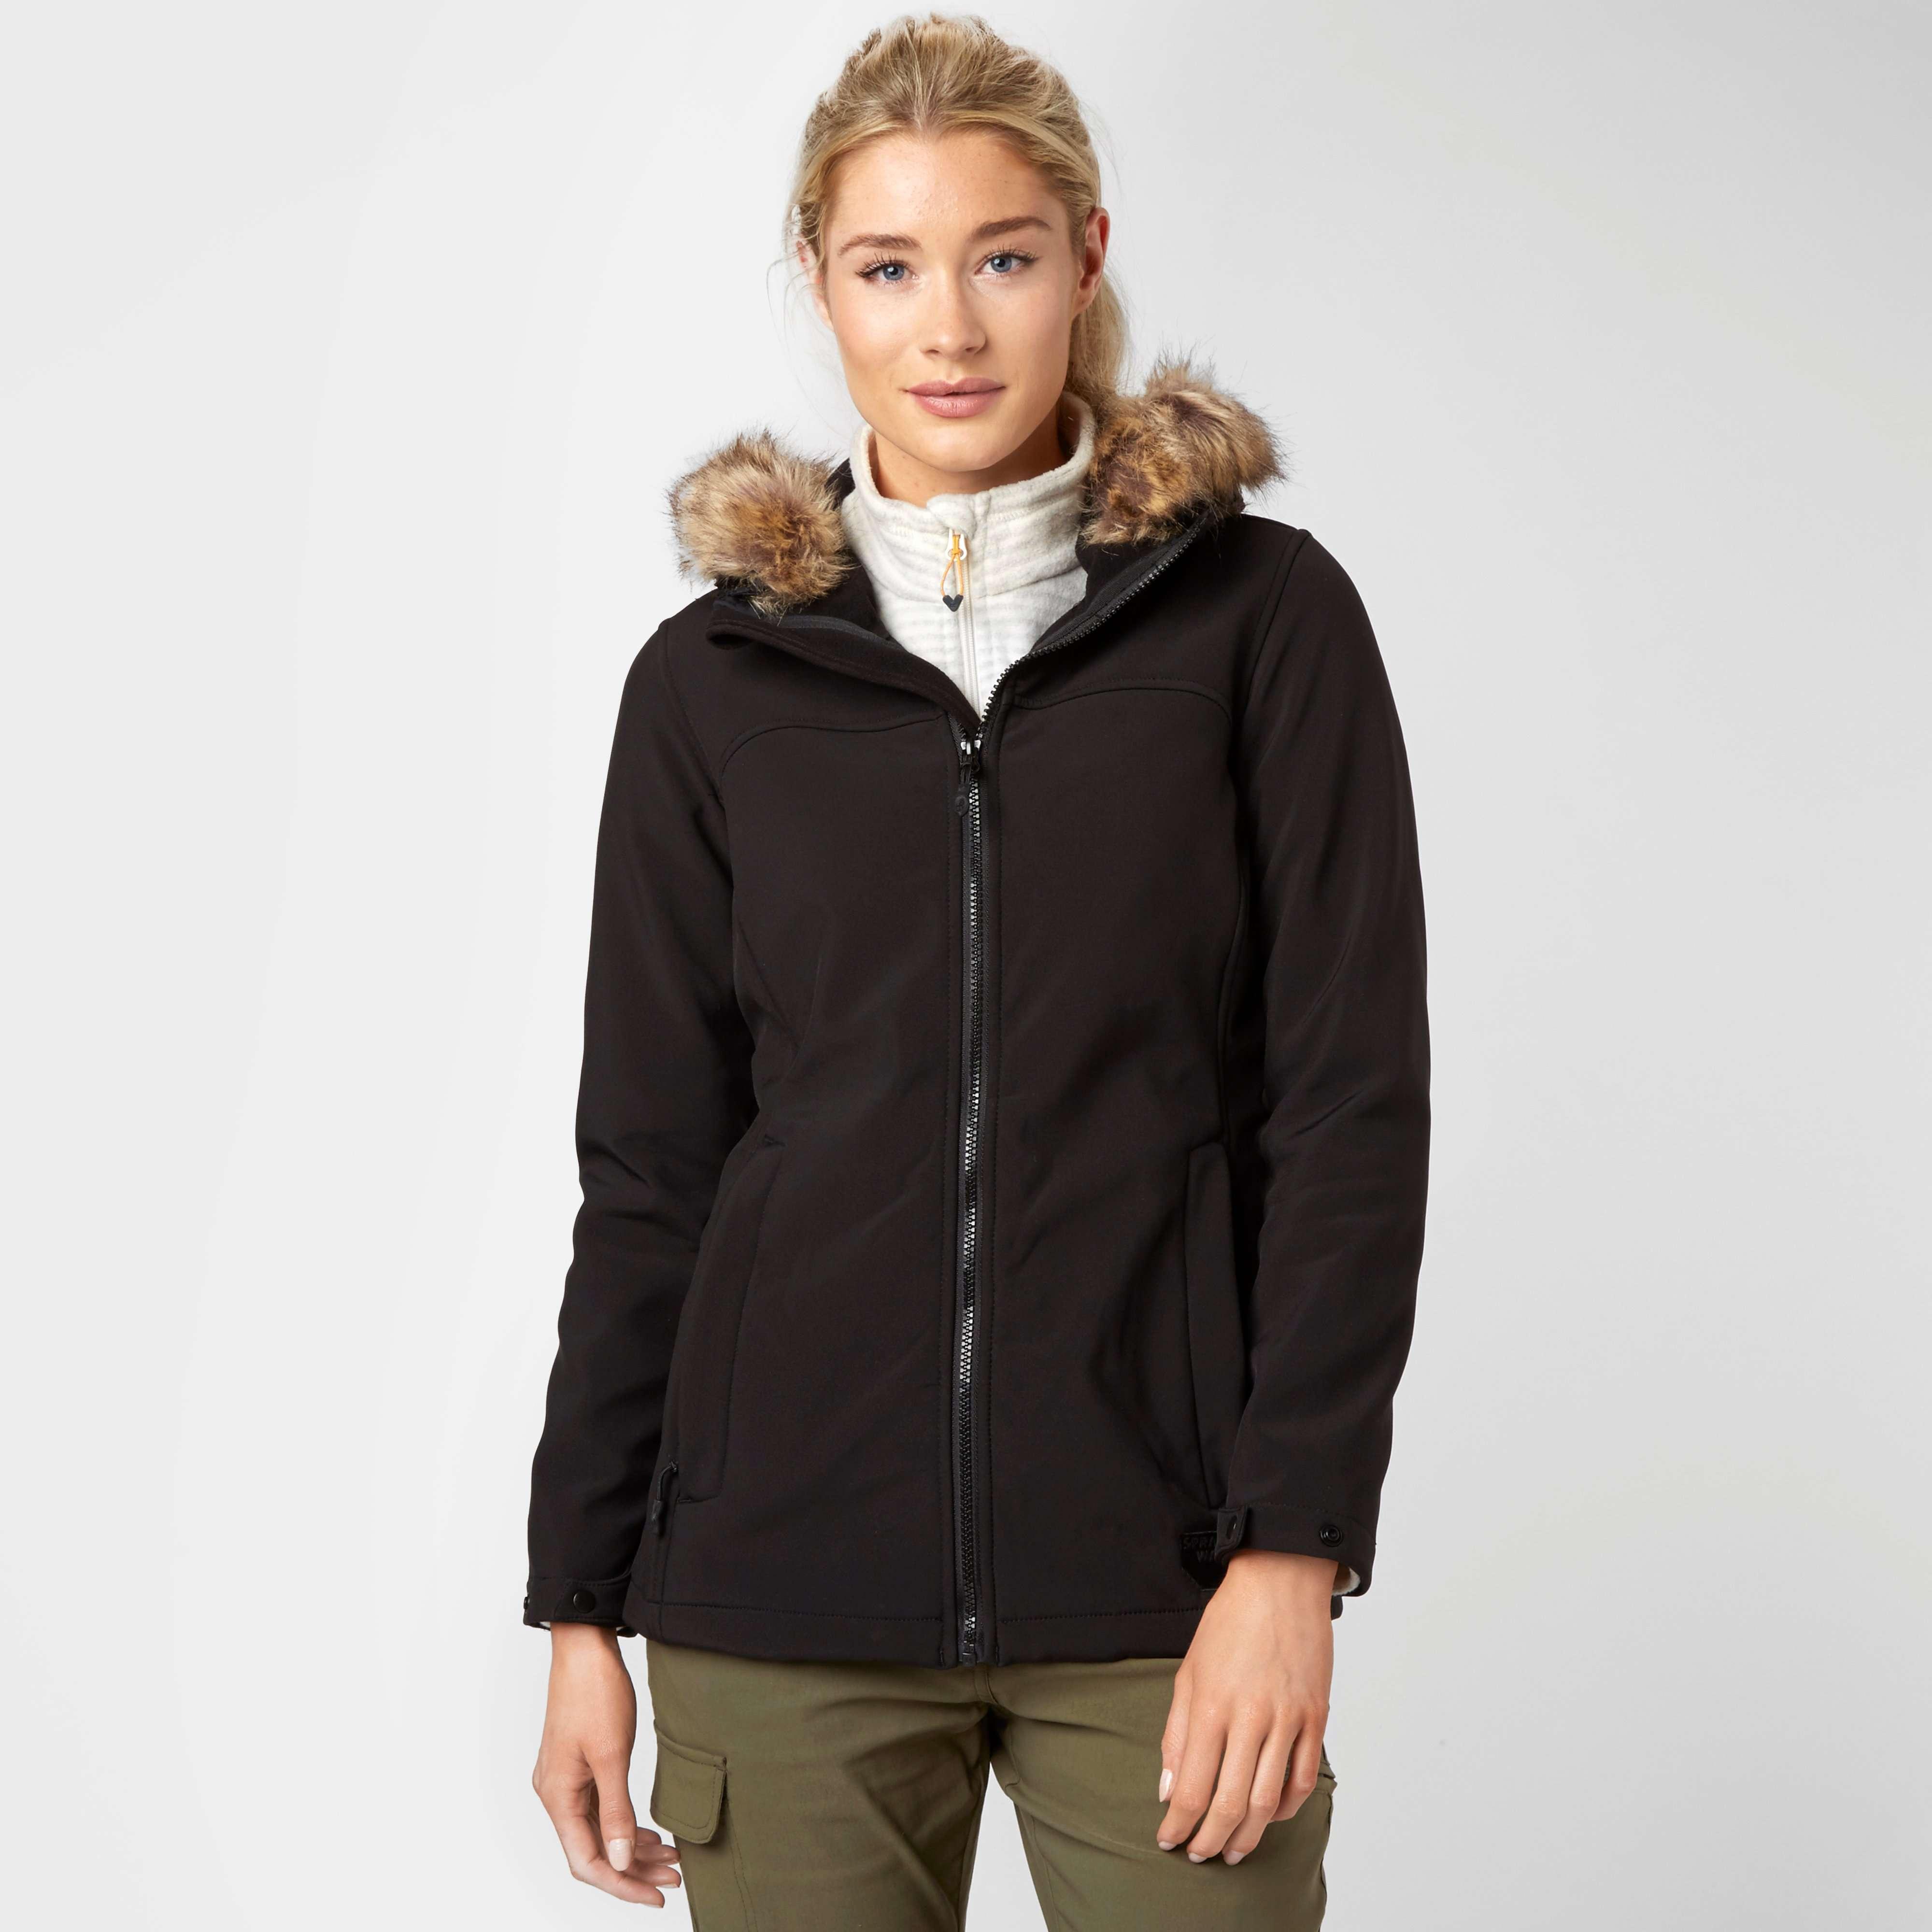 SPRAYWAY Women's Caldera Hooded Jacket